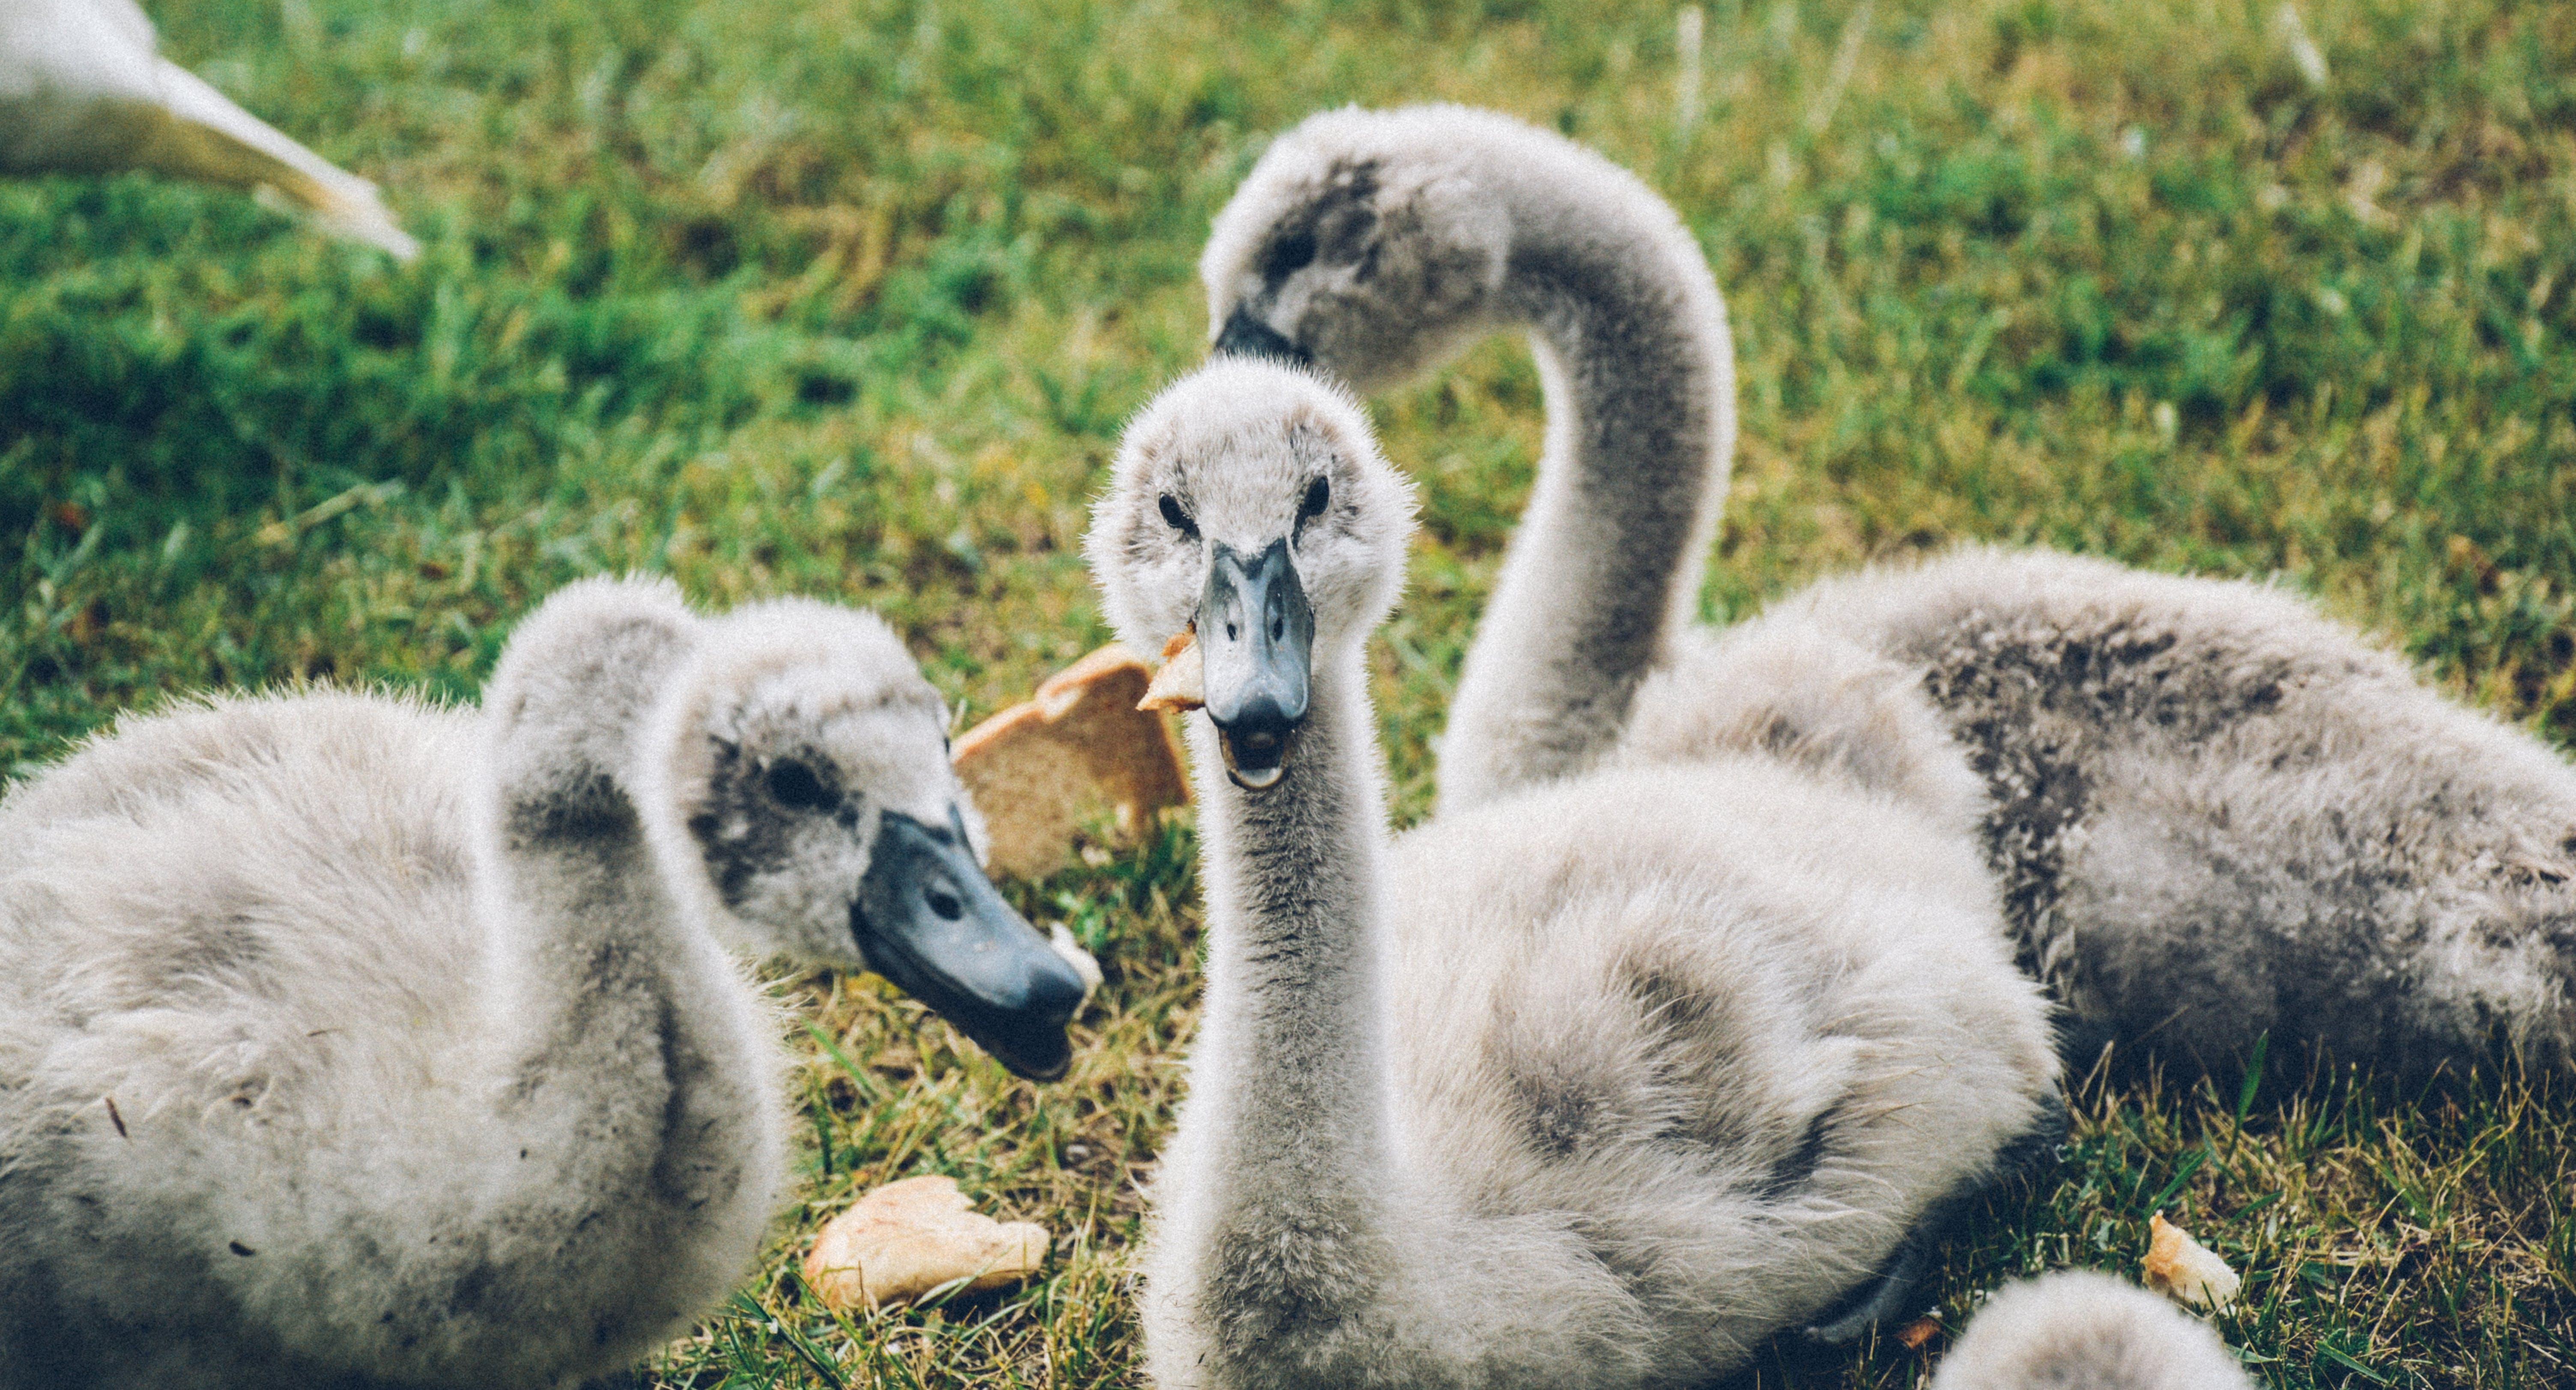 Gray Ducks Under Sunny Sky